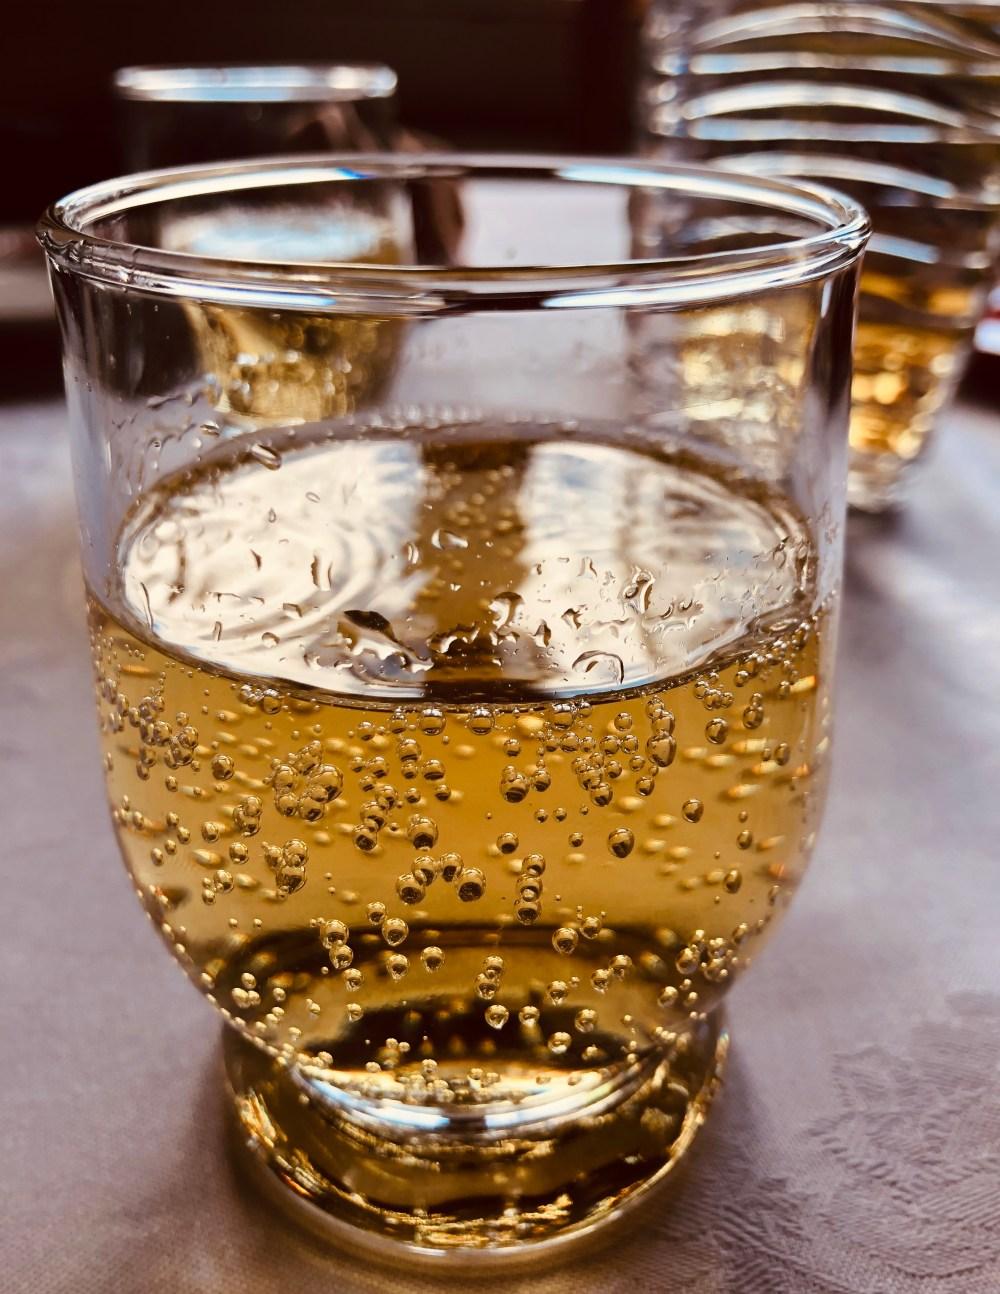 Gläser mit sprudelndem strahlendem Apfelsaft